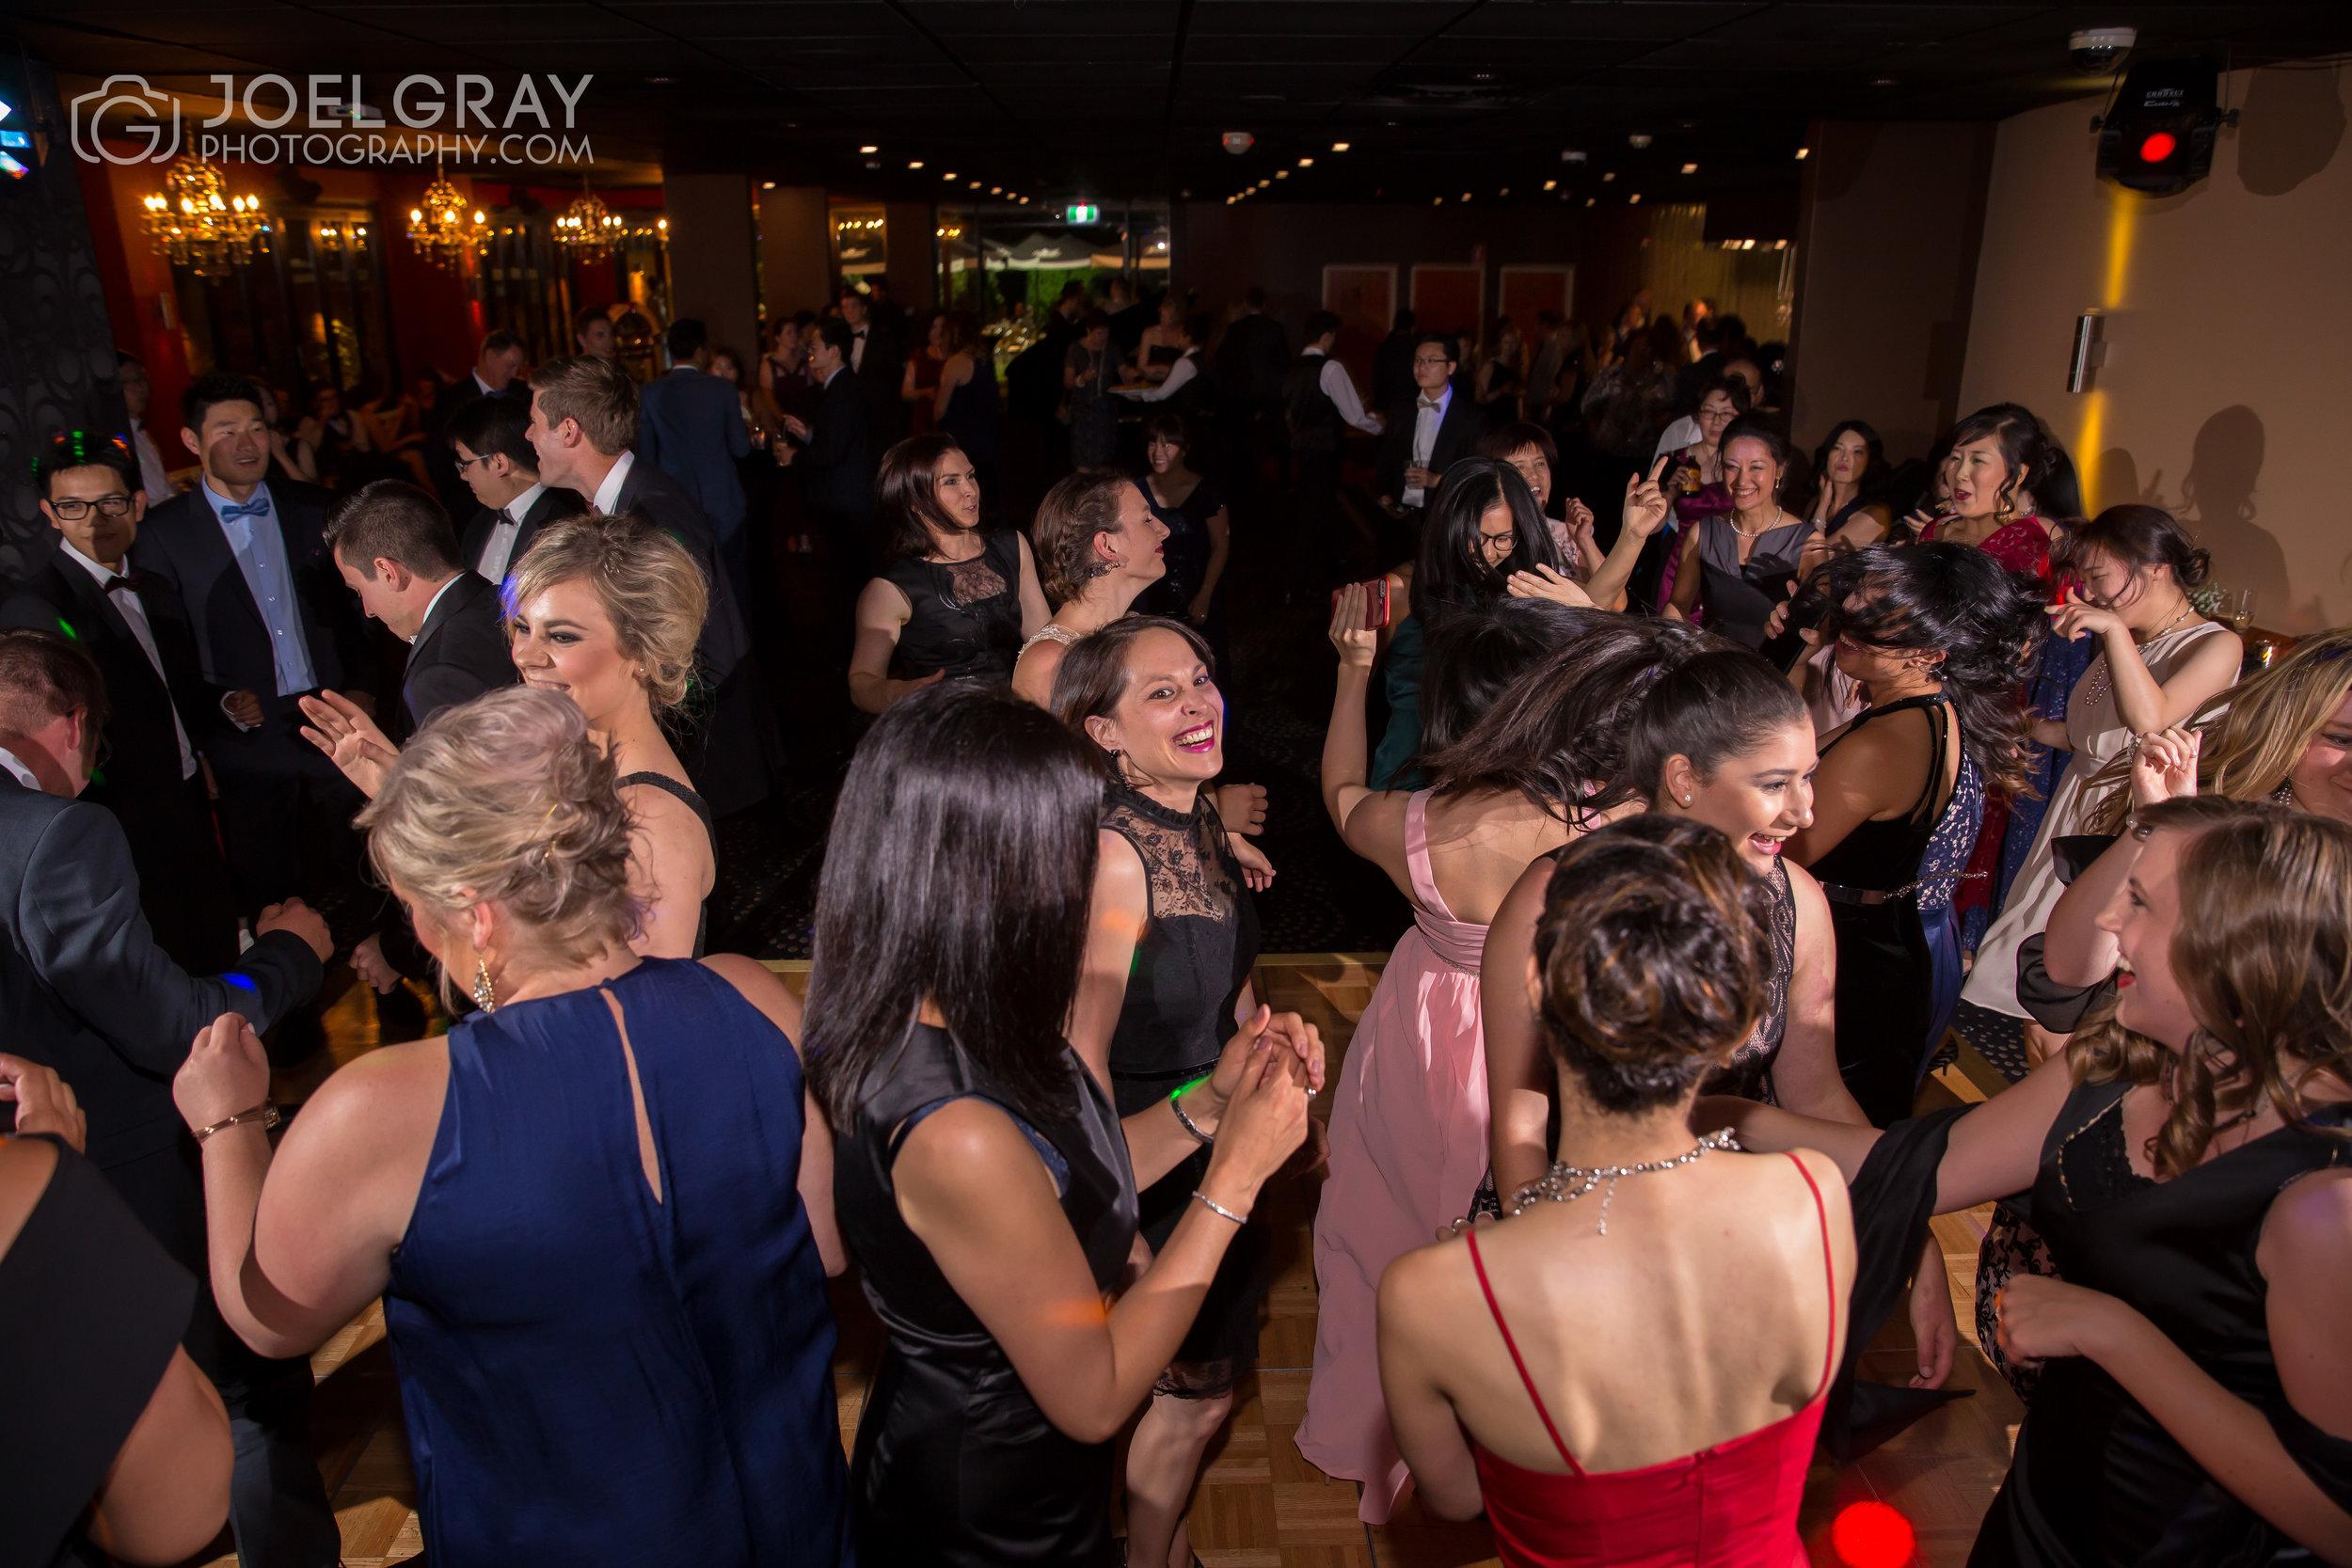 dance-floor-photography-sydney-photographer-1800829994